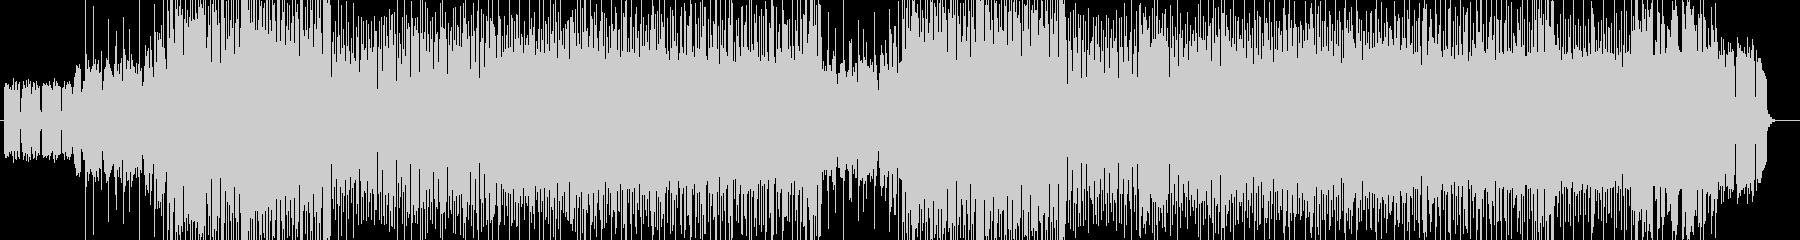 「HR/HM」「DARK」BGM119の未再生の波形